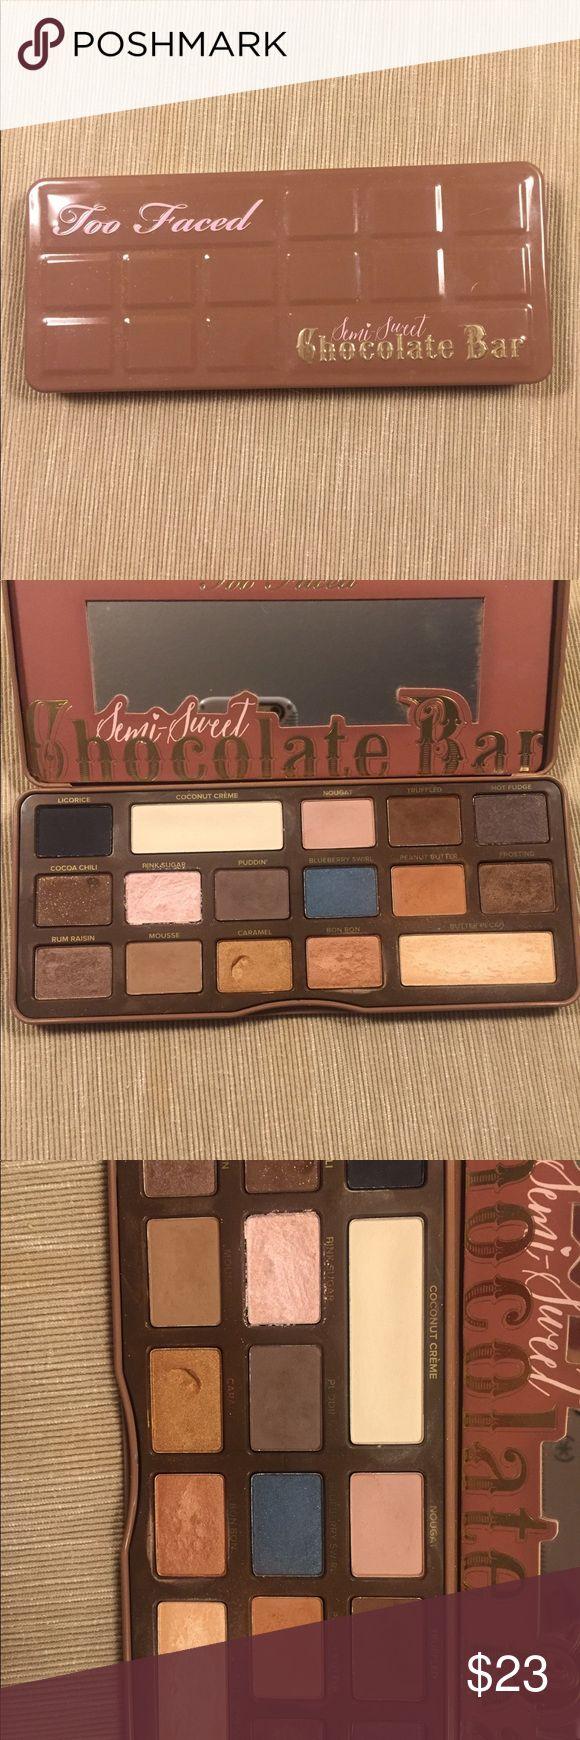 Too Faced Semi-Sweet Chocolate eyeshadow palette Too Faced semi-sweet chocolate eyeshadow palette, gently used, great condition Too Faced Makeup Eyeshadow